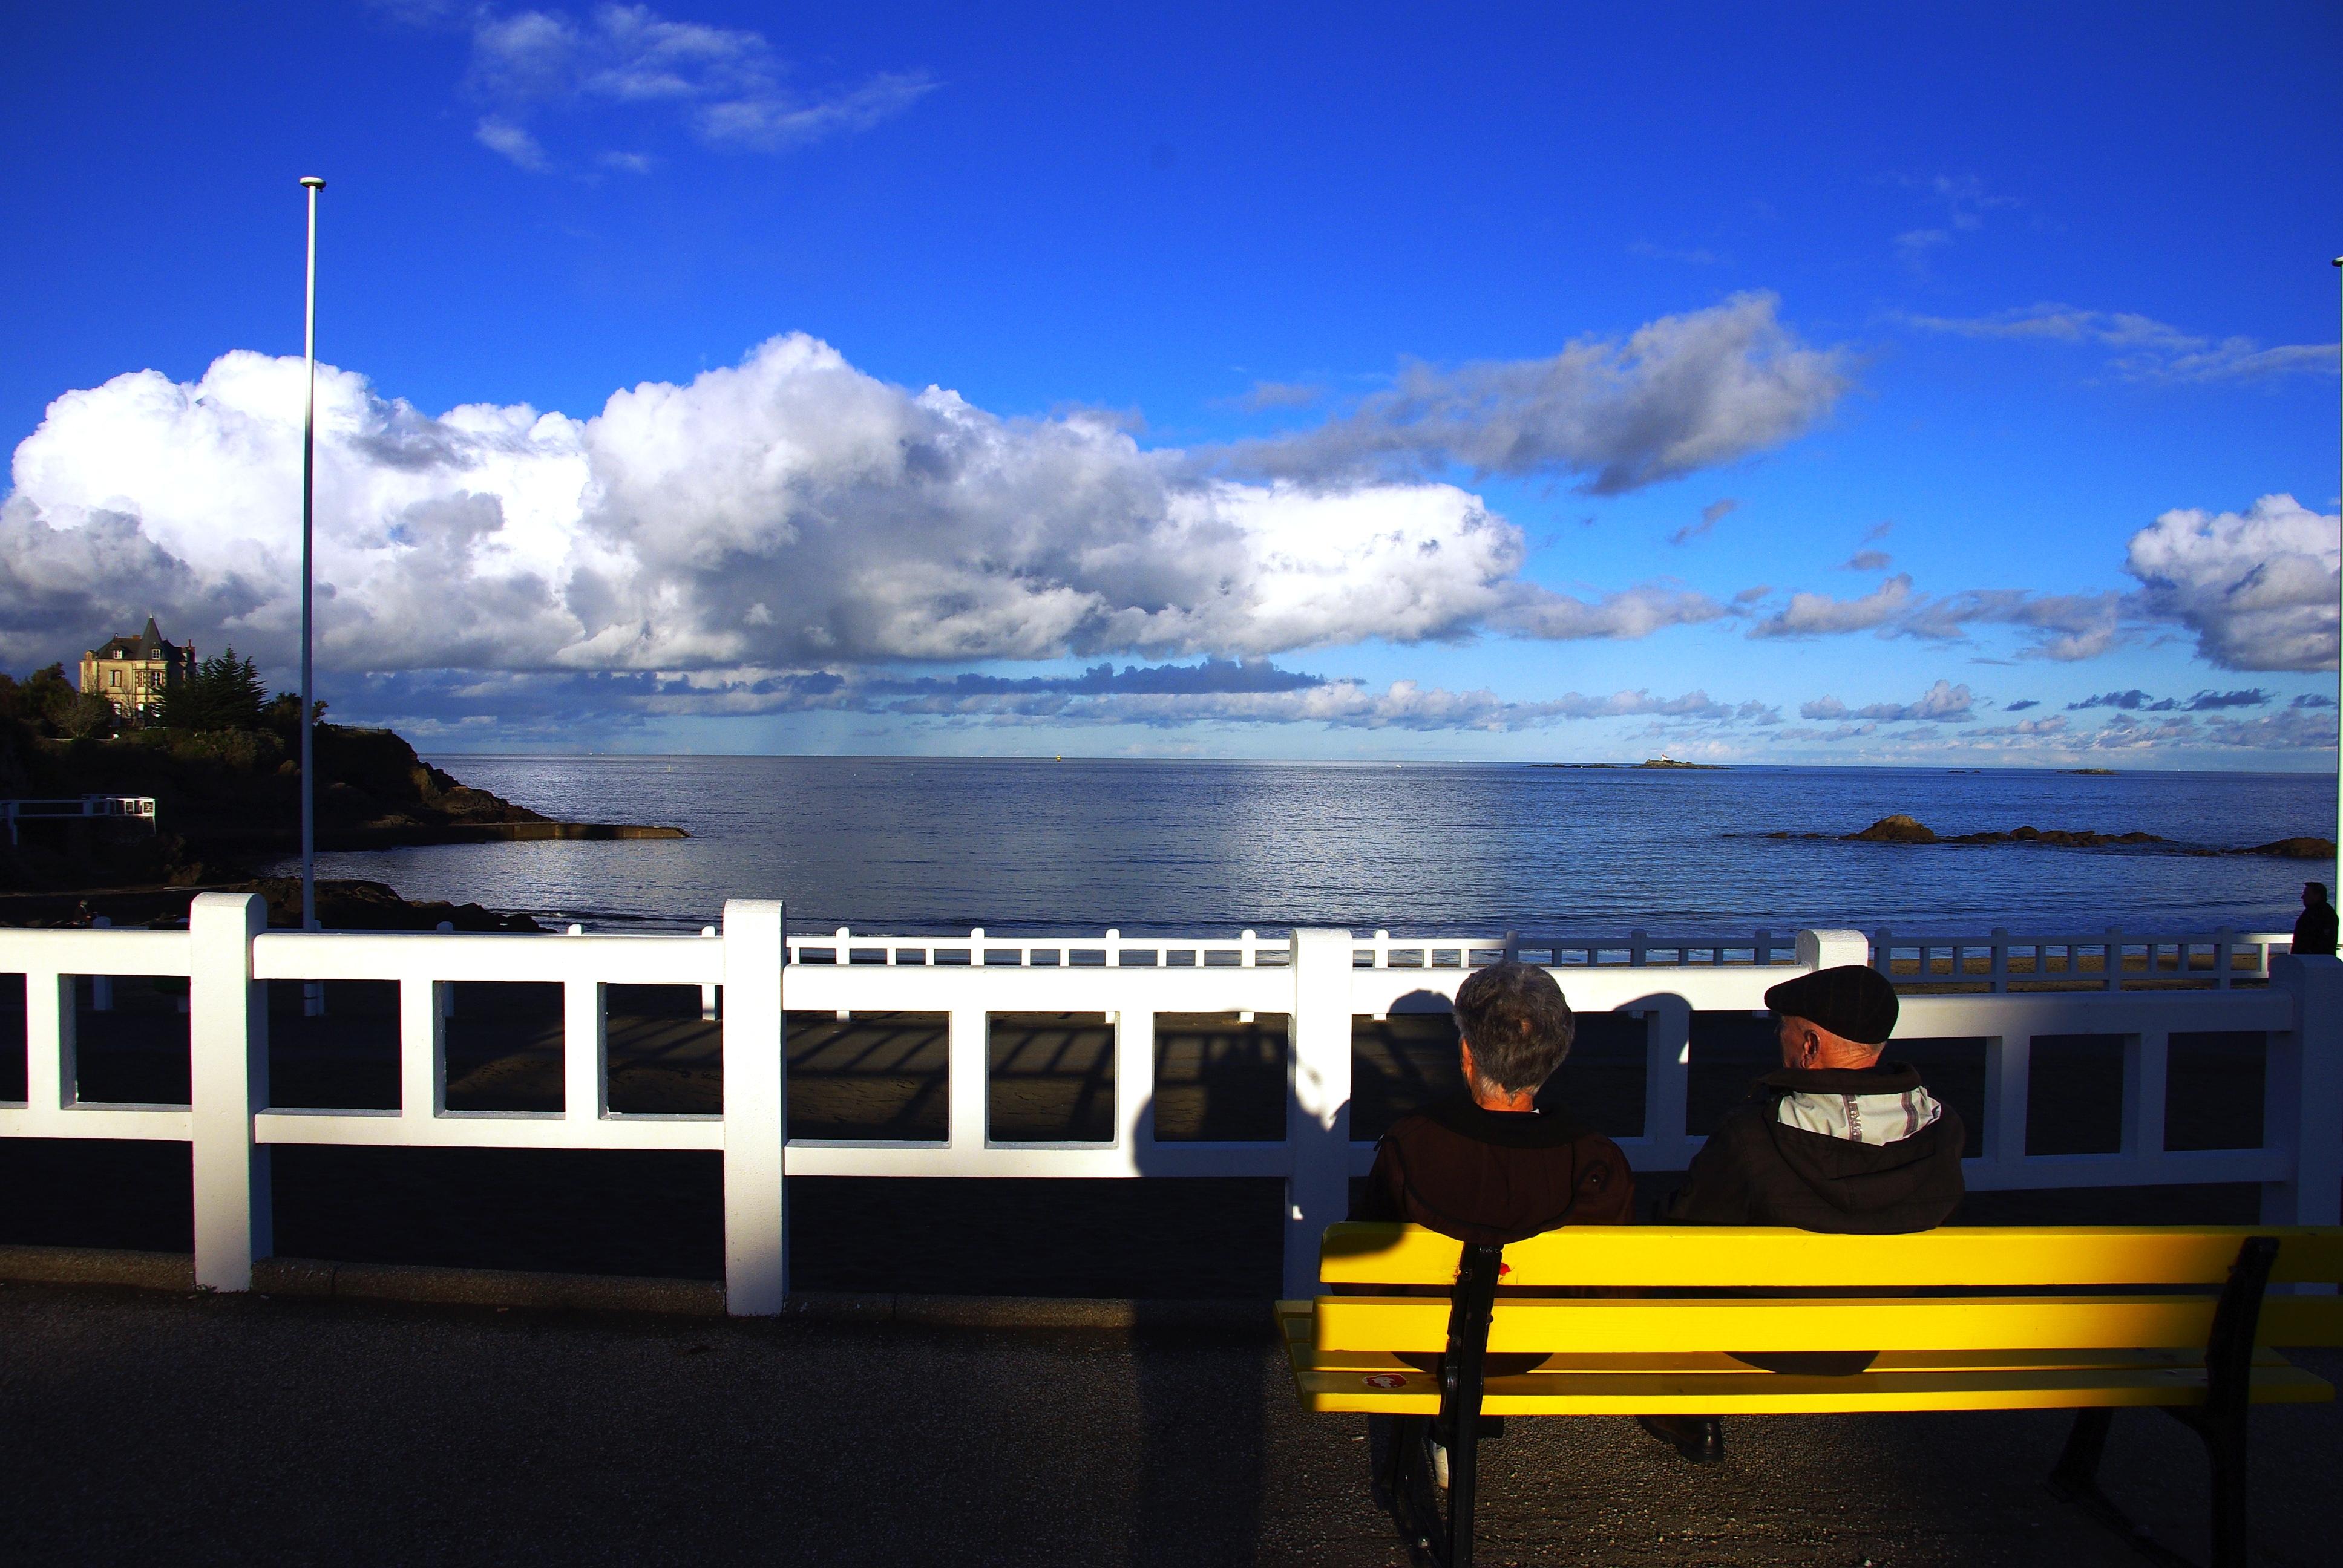 prendre le temps de regarder la mer